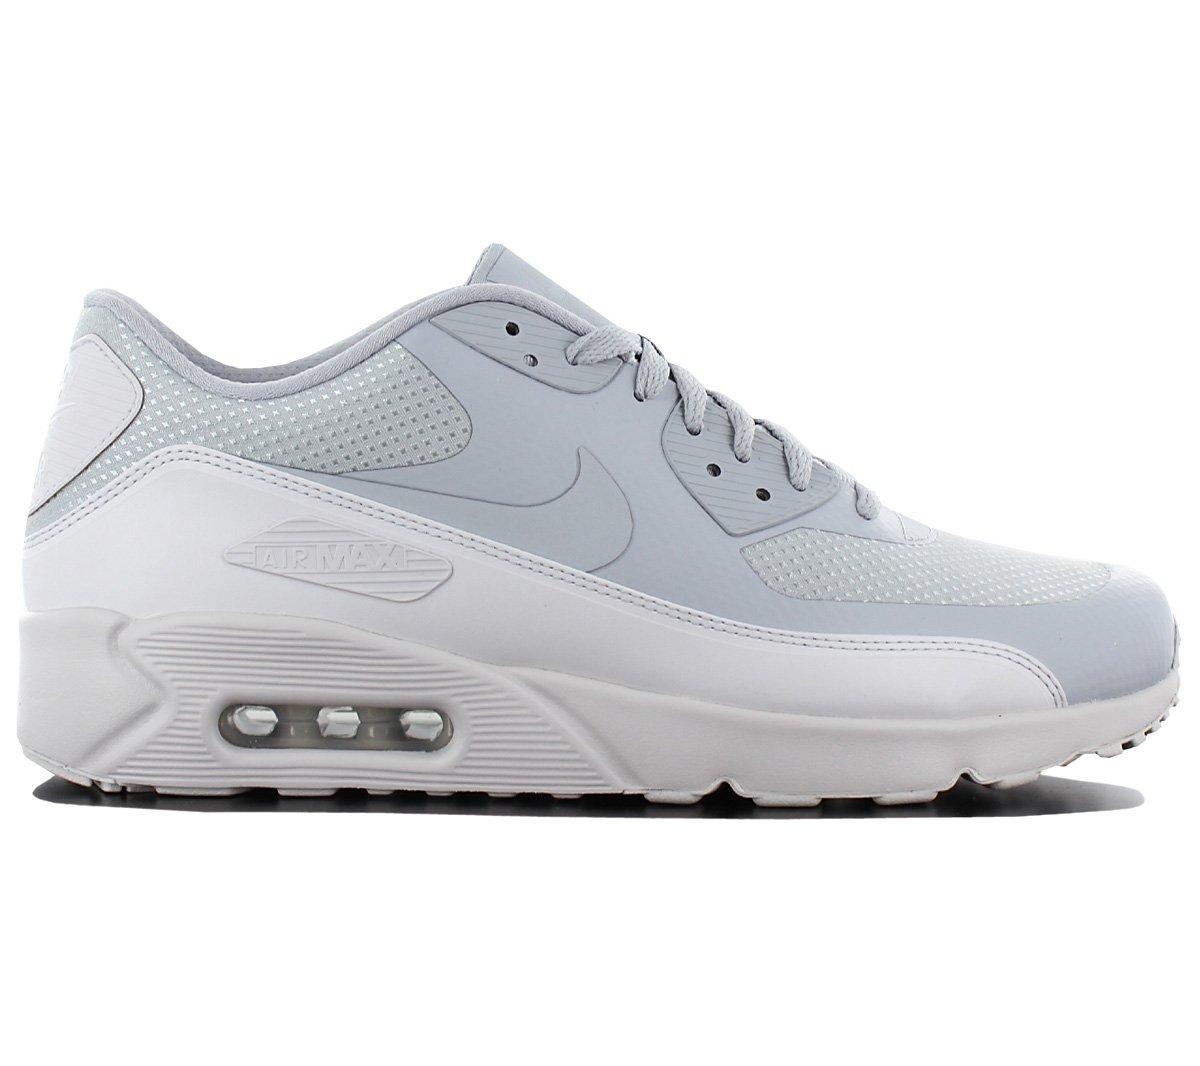 Nike Air Max 90 Ultra 2.0 Essential 875695-017 Herren Schuhe Sneaker Turnschuhe Grau-Weiszlig; Top  45 EU|Grau (Grau-grau)